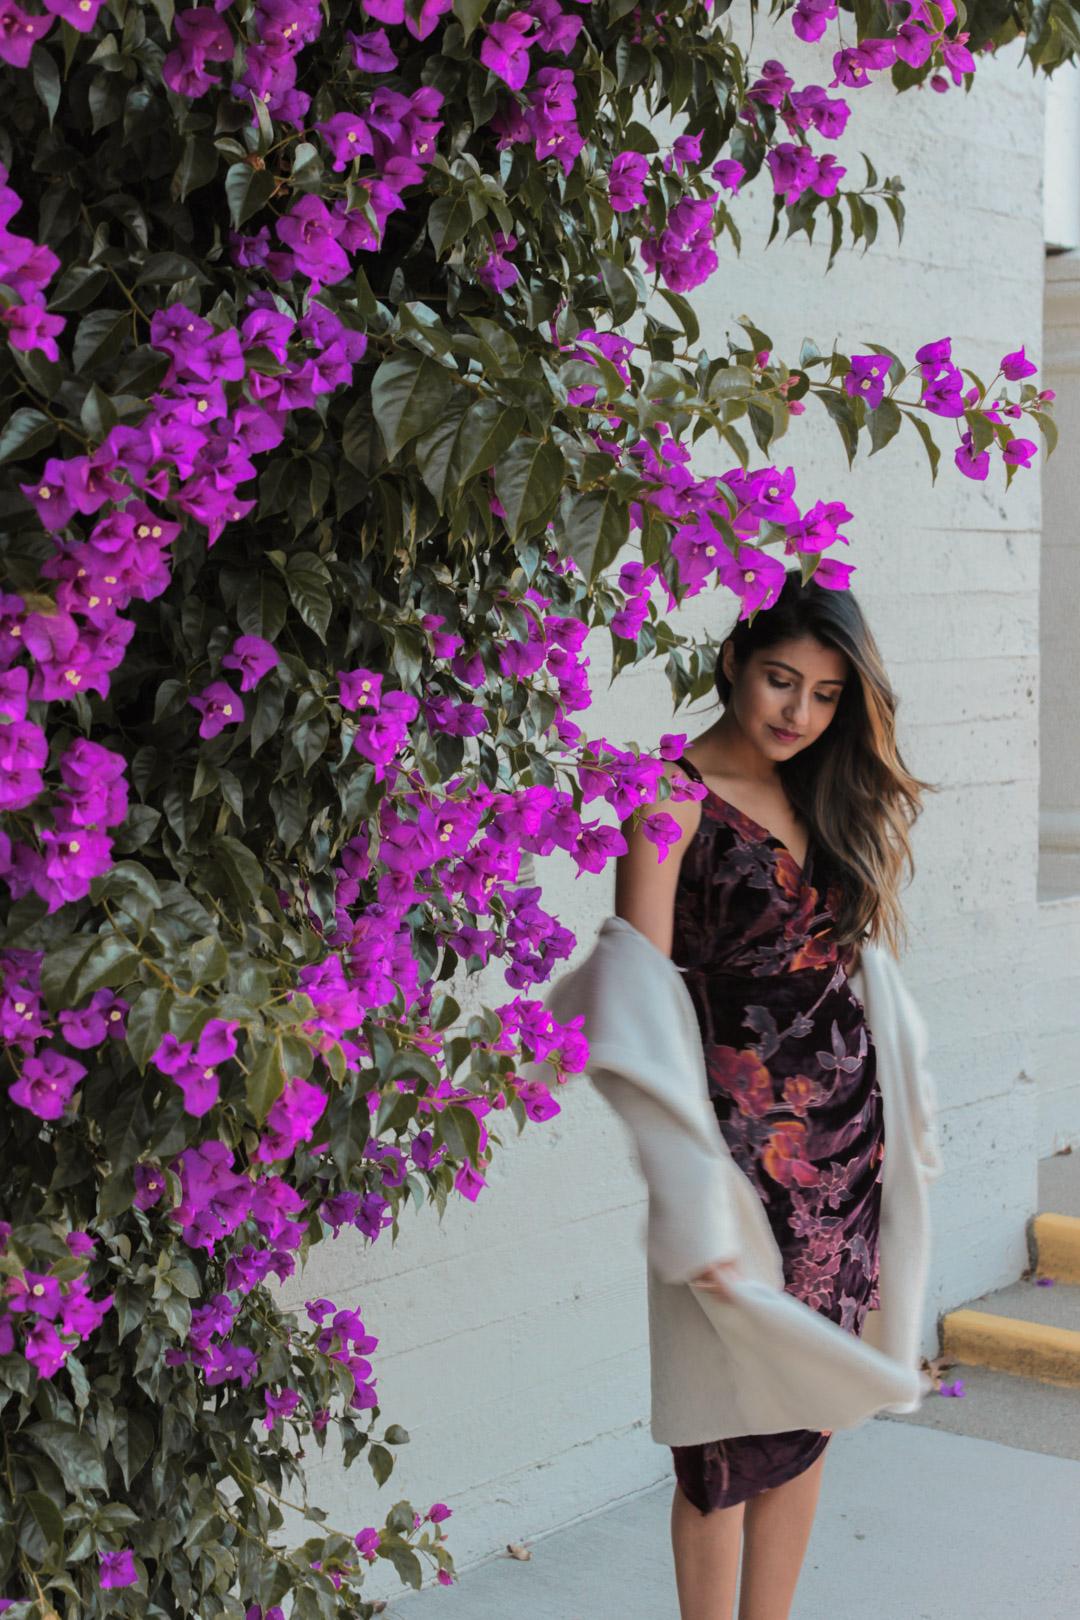 velvet-wrap-floral-dress-nye-party-style 1